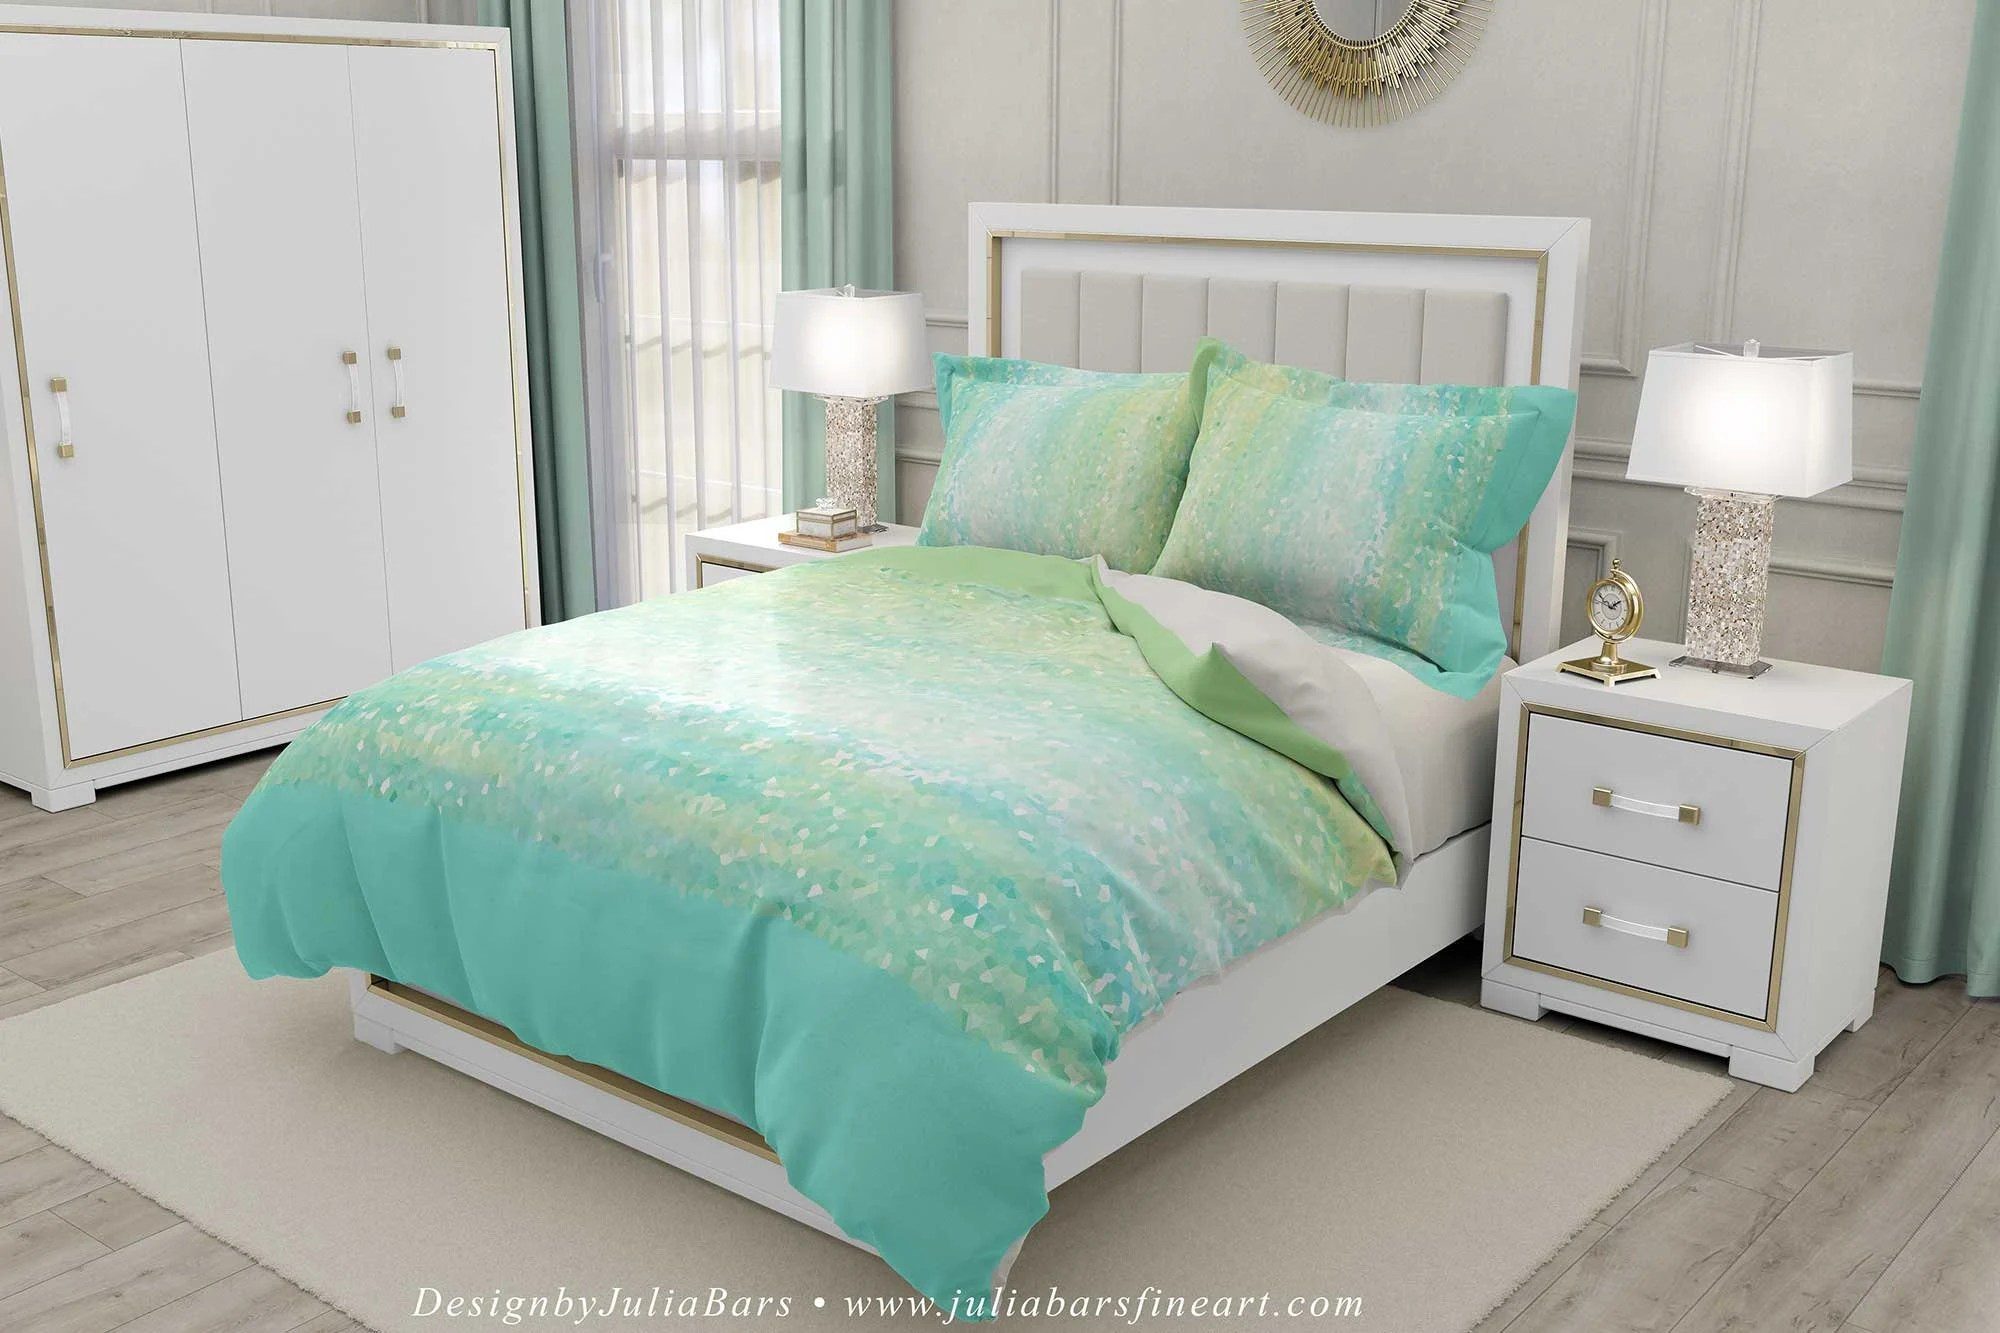 mint green duvet cover pillow cases seafoam aqua blue abstract coastal bedding pillow shams beach life bedroom decor king queen twin